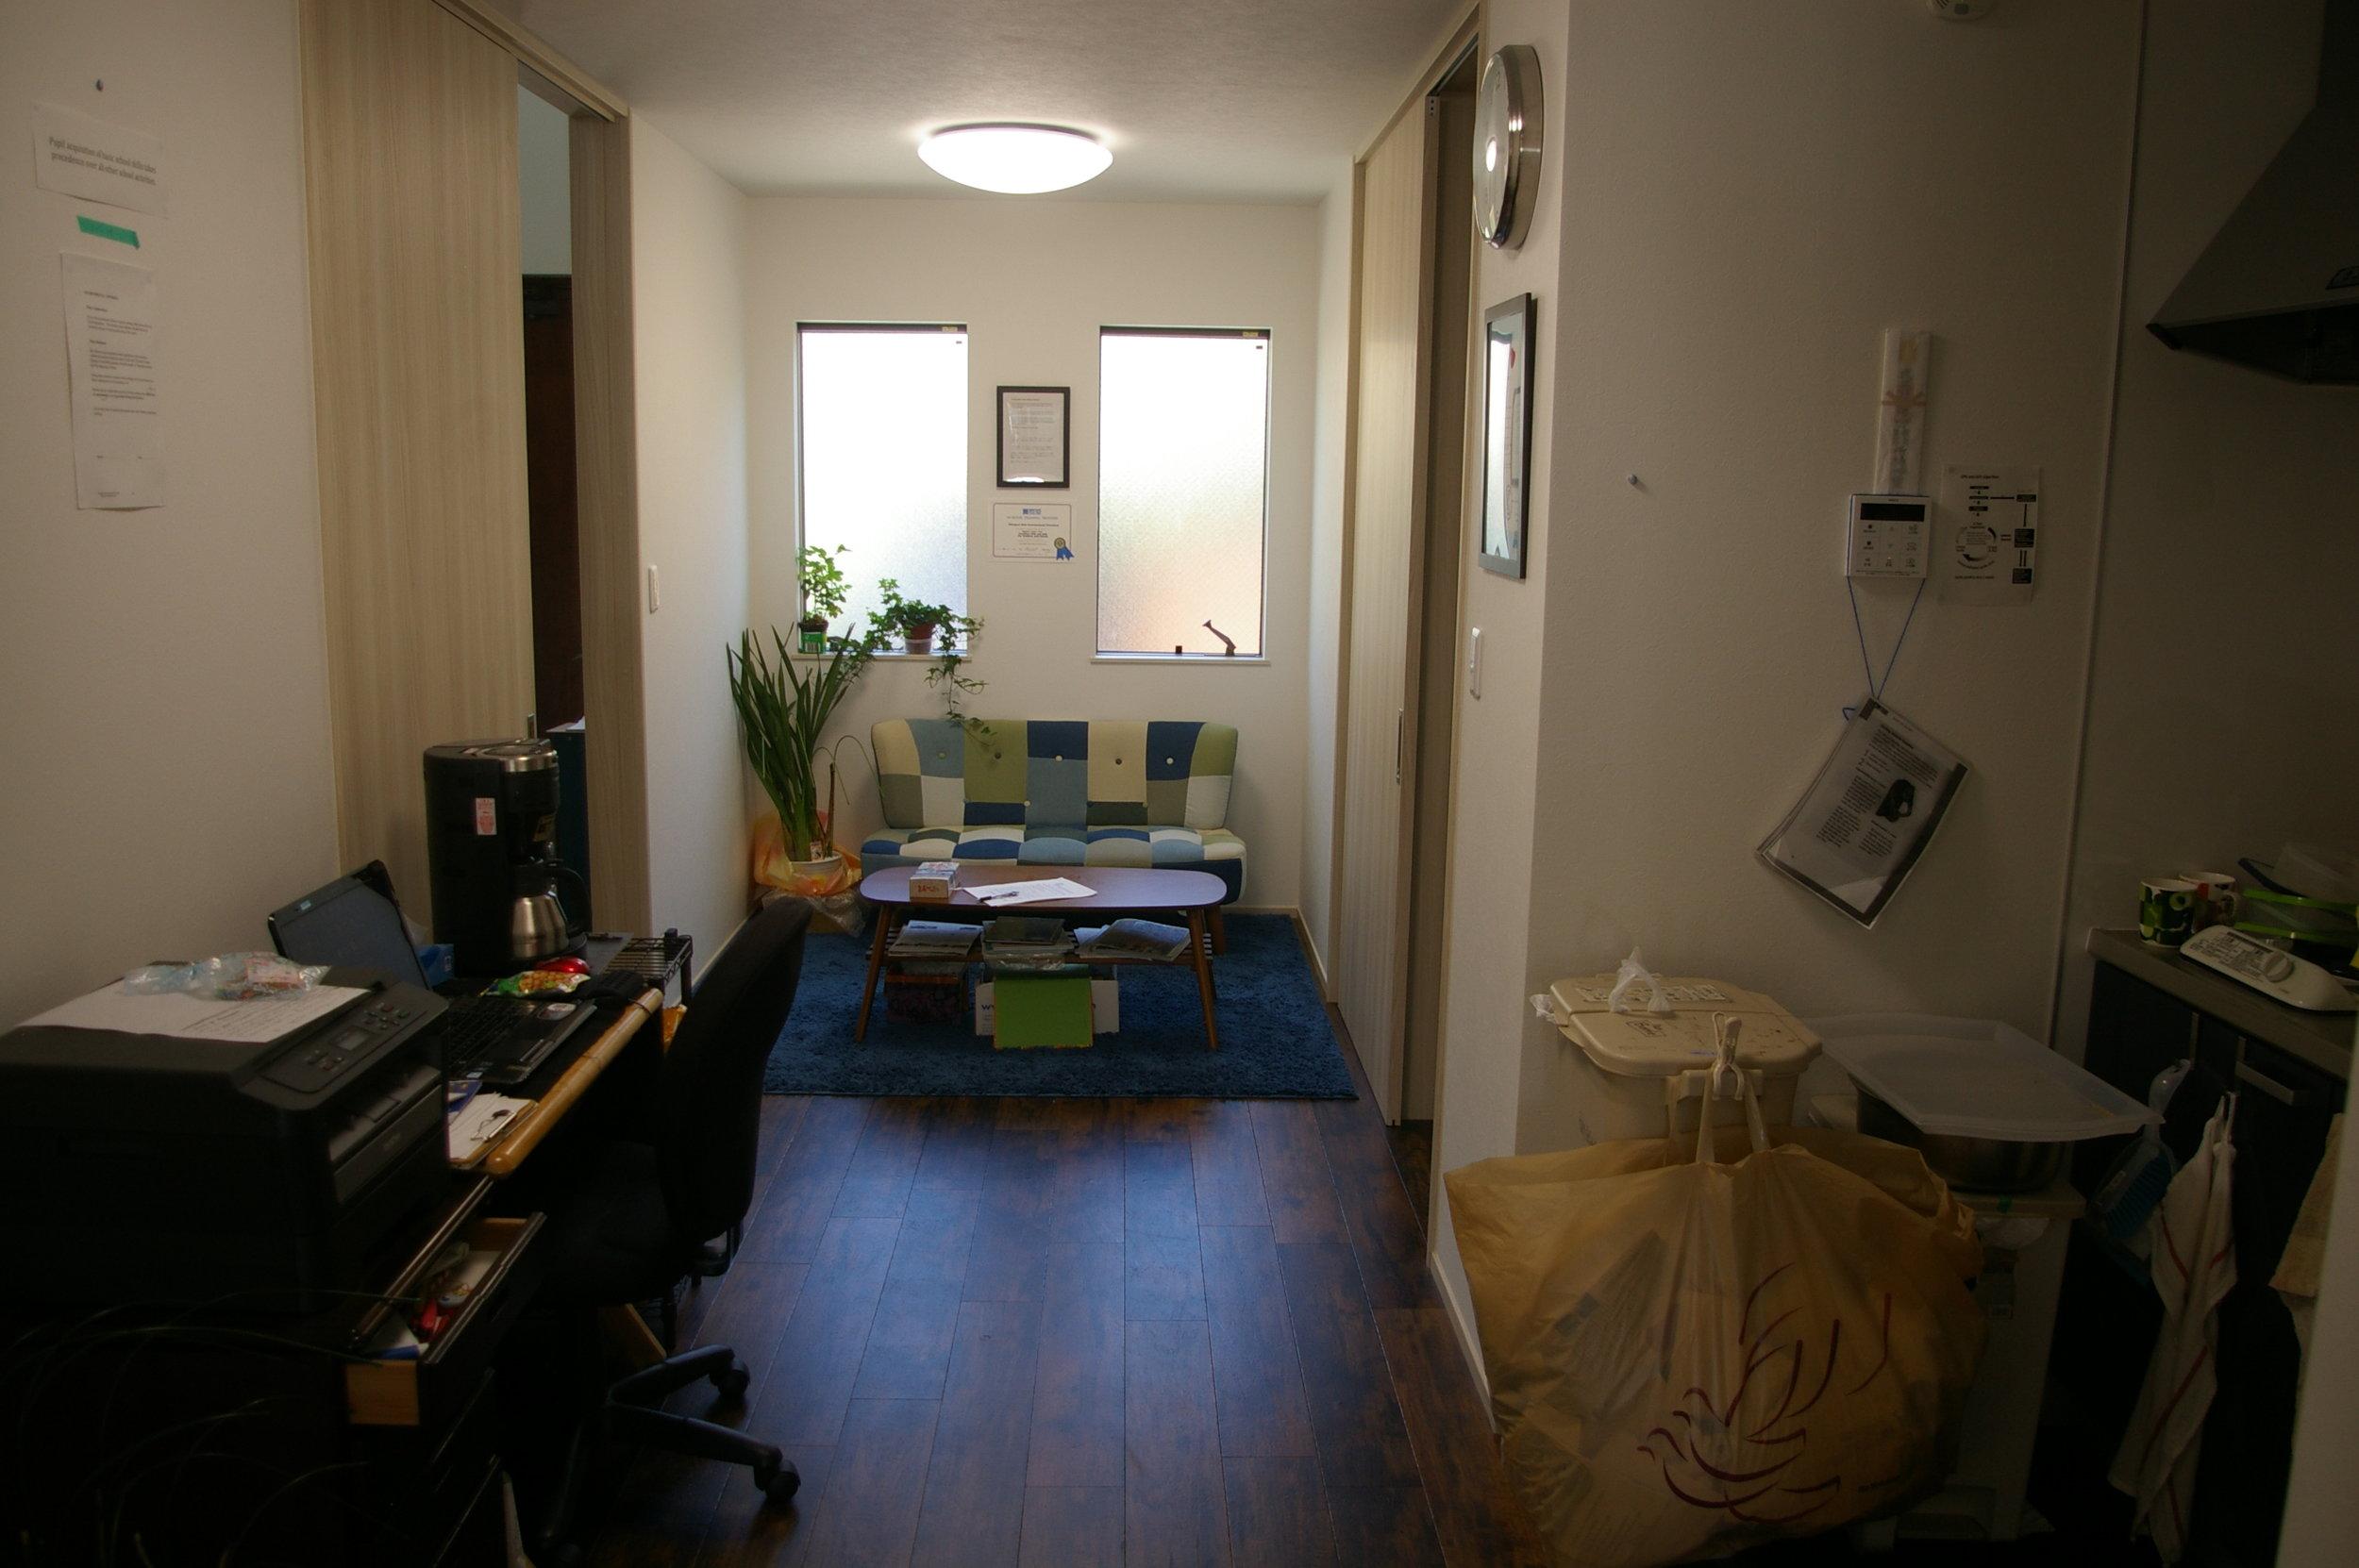 Interview Room /Staff Room  面談ルーム / スタッフルーム